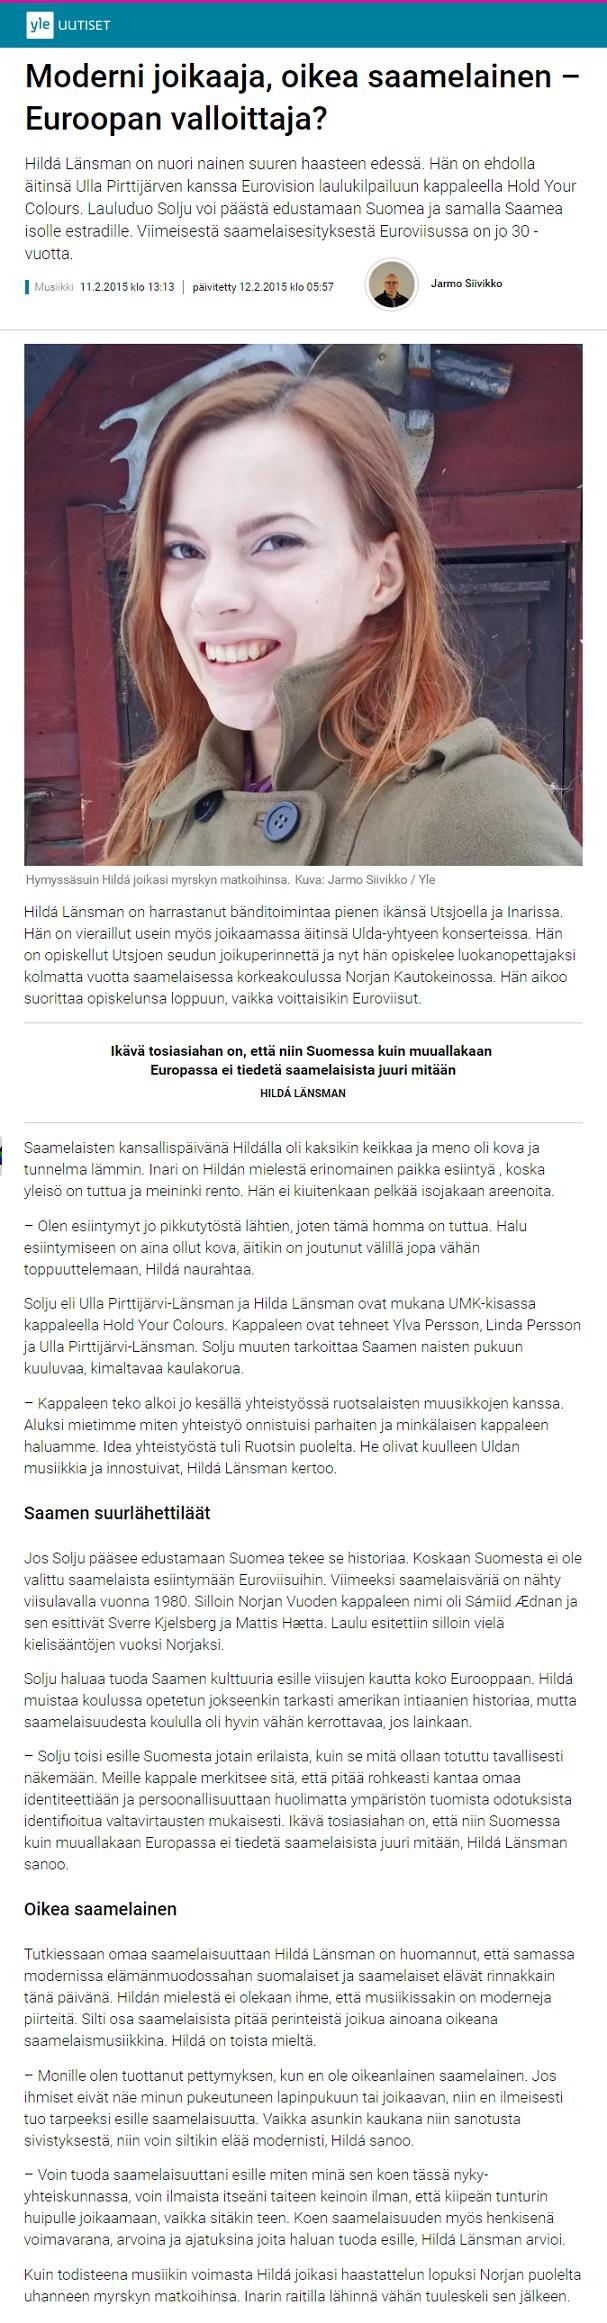 Yle uutiset (Finland), 11.2.2015